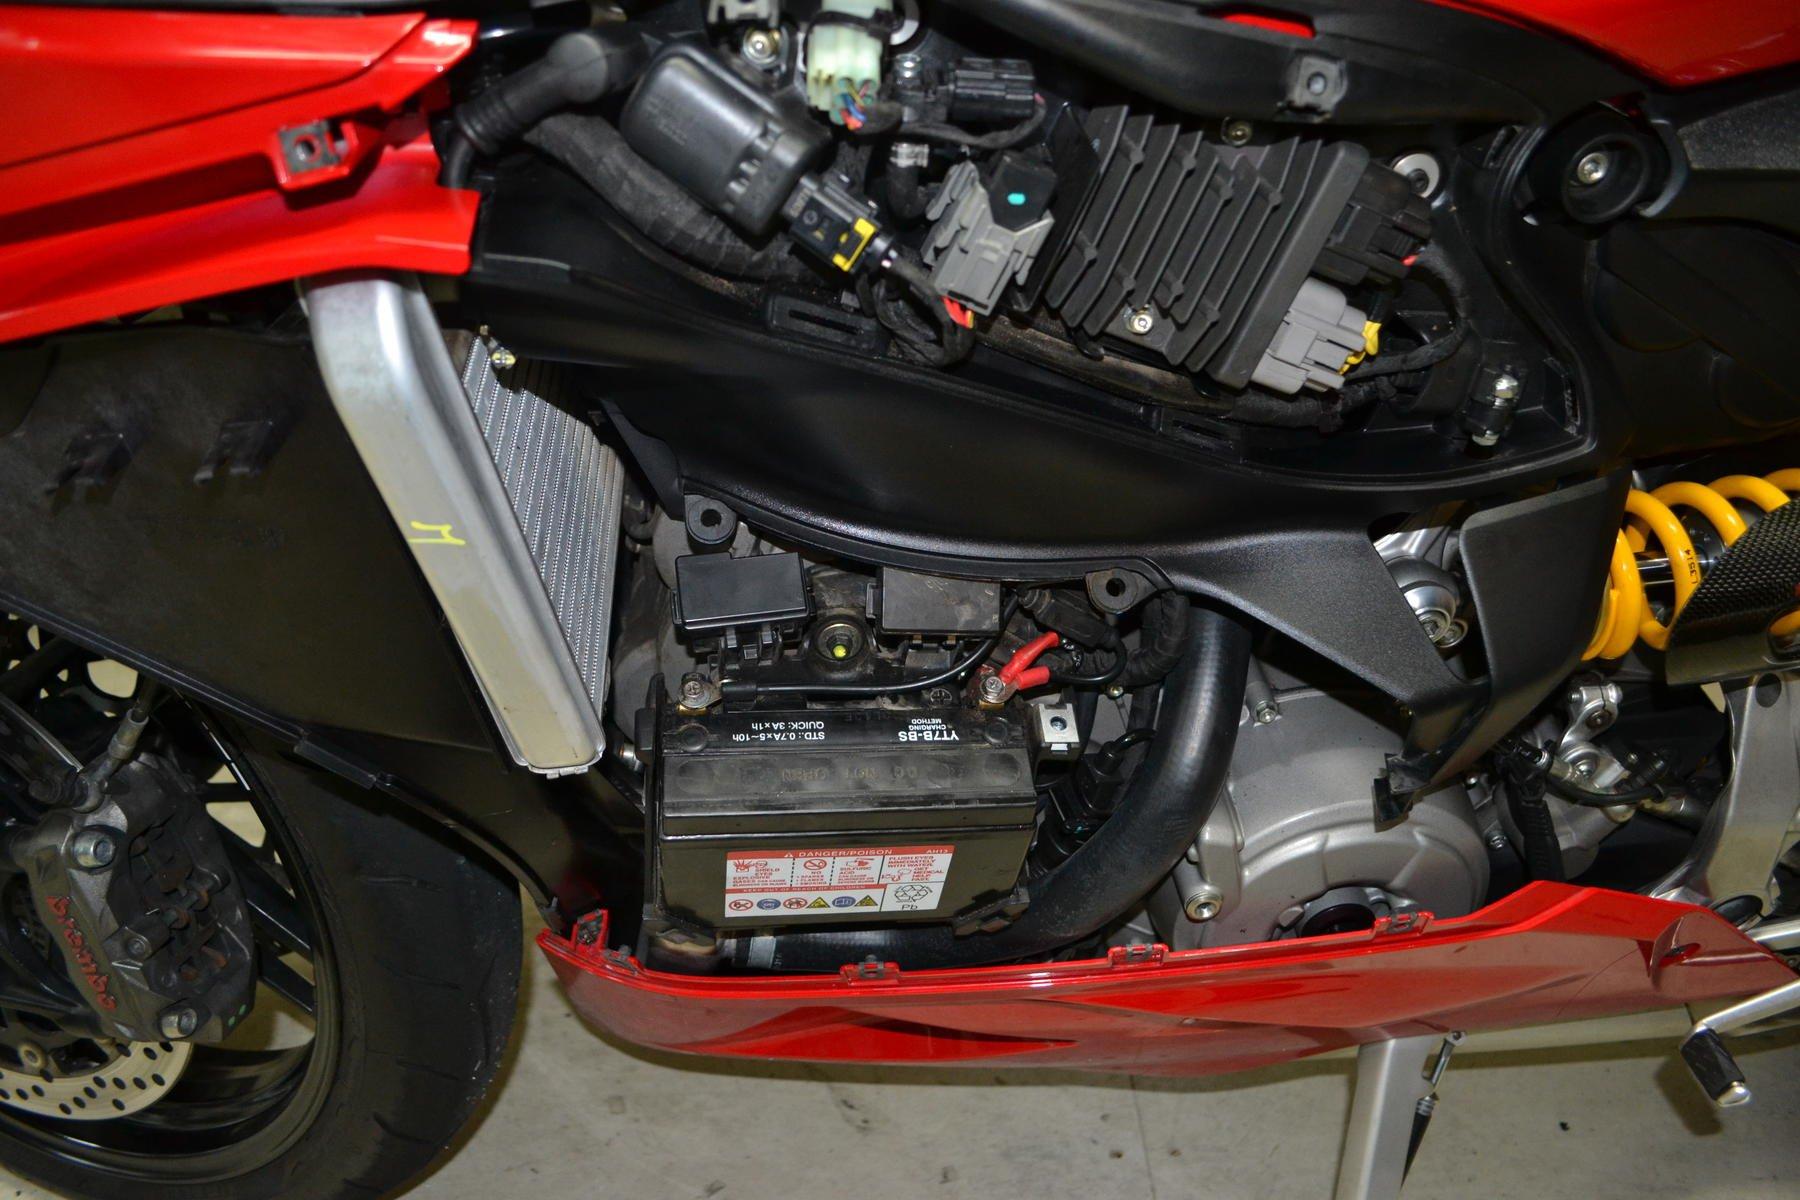 Ultrabatt Lithium Battery Installed